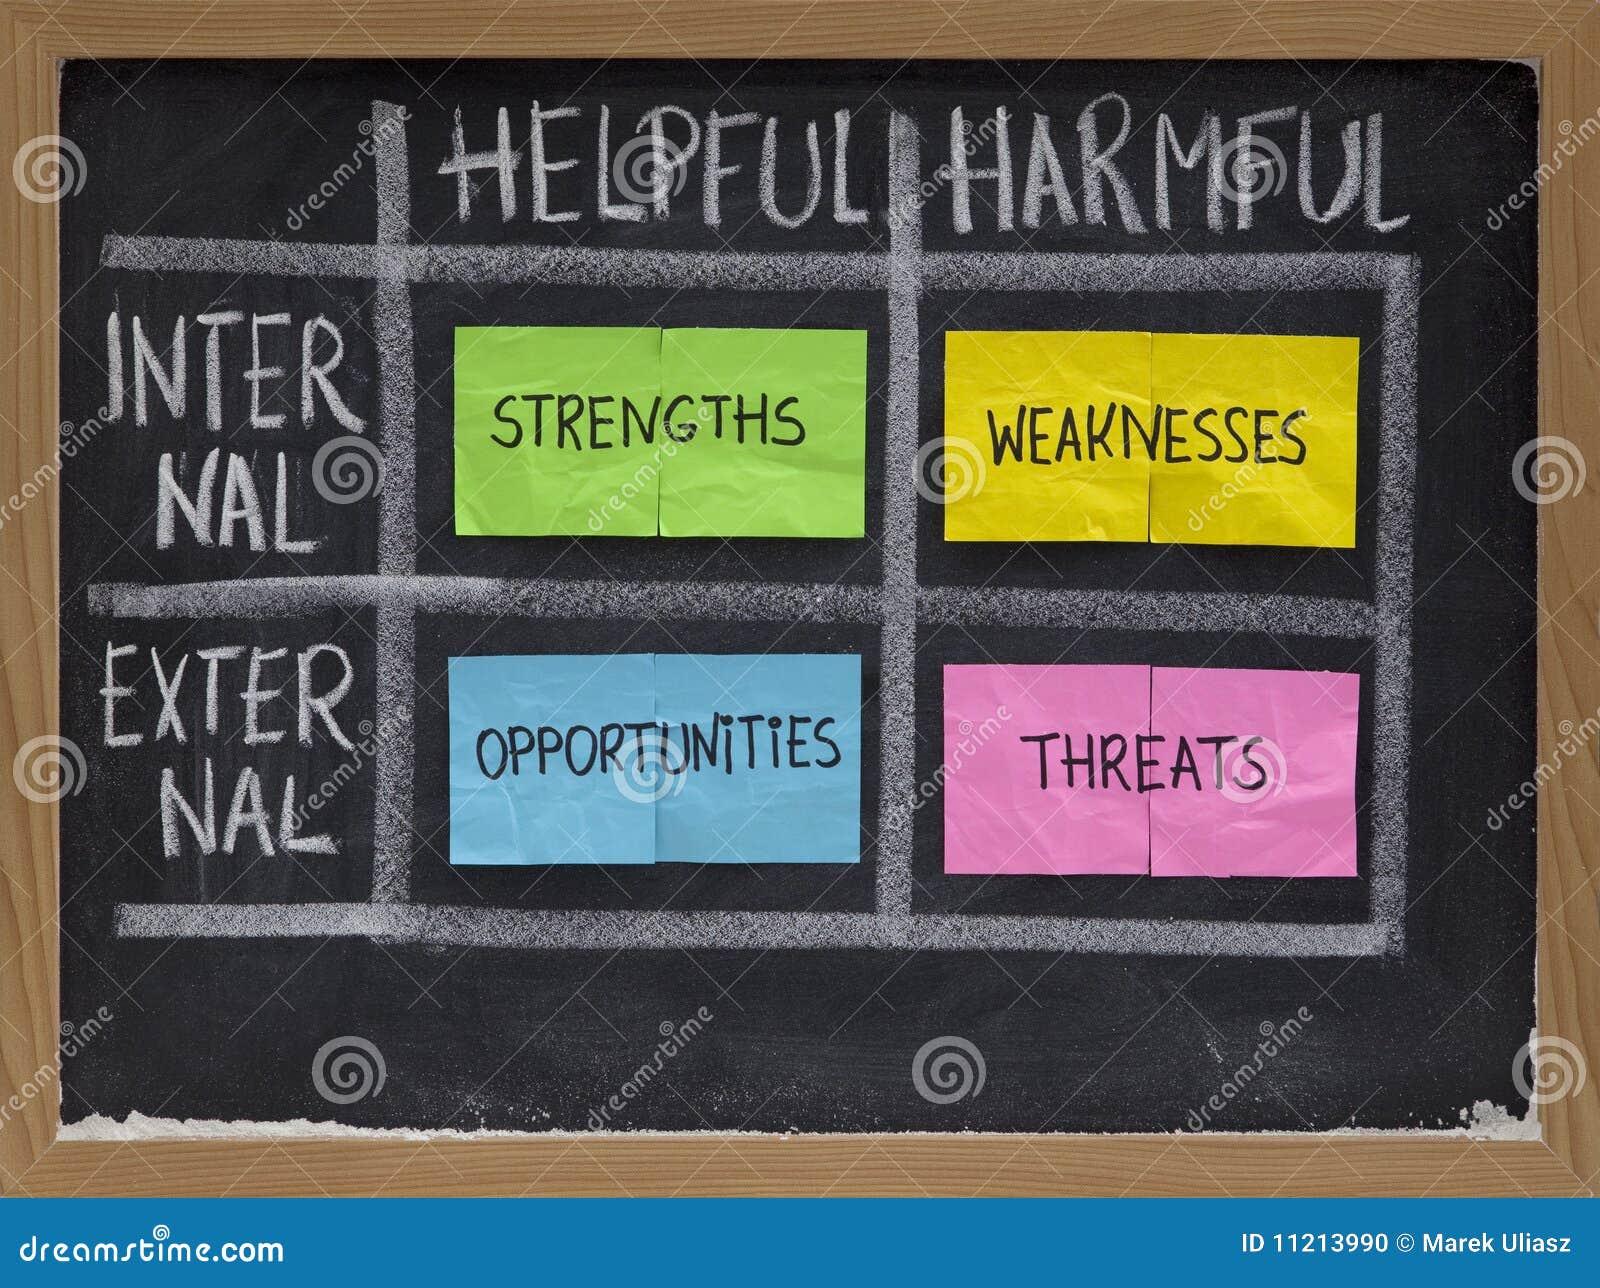 strengths weaknesses opportunities threats stock photo image strengths weaknesses opportunities threats